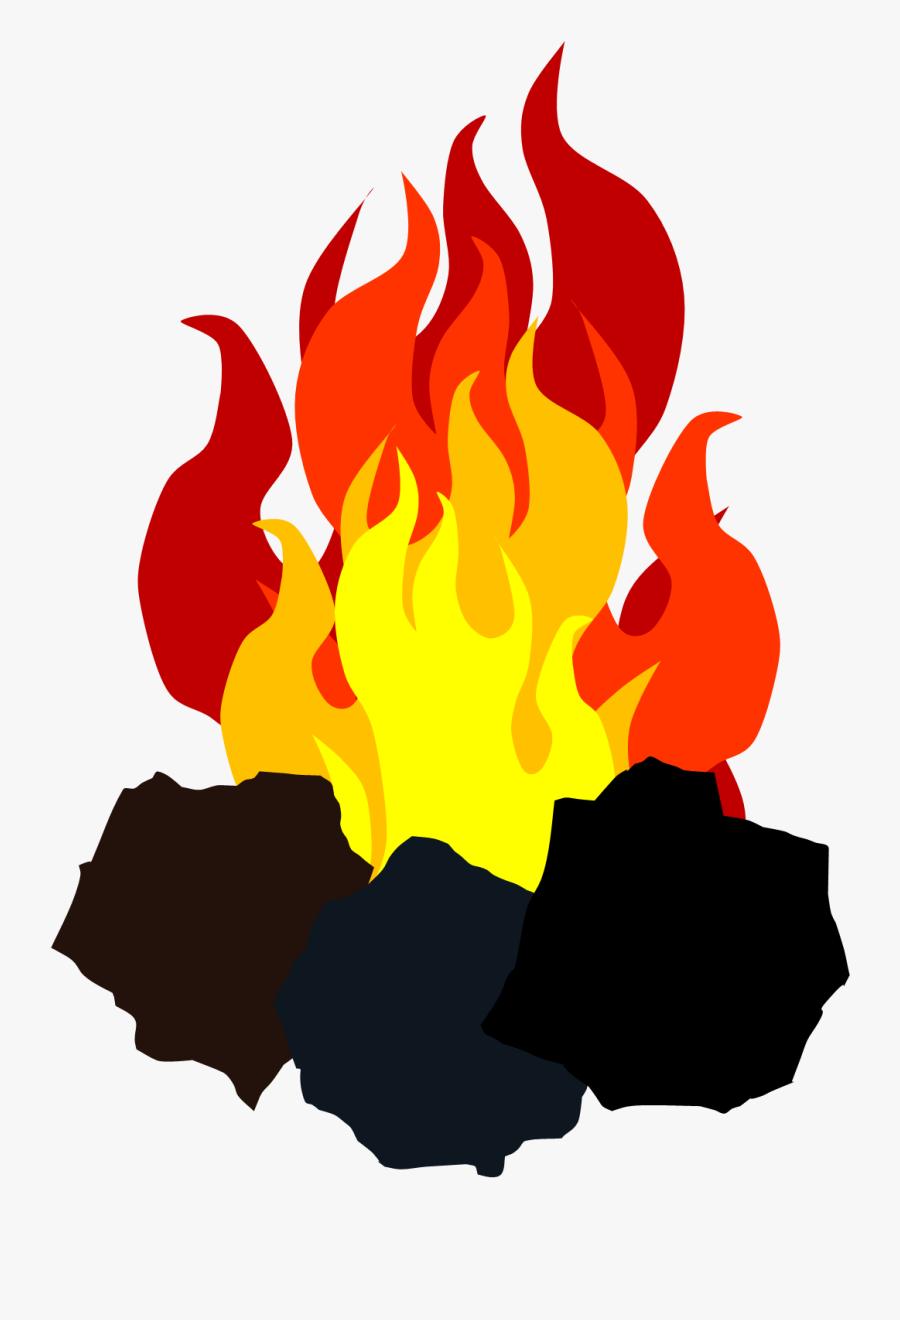 Clip Art Fire Illustrations - Coal And Fire Png, Transparent Clipart